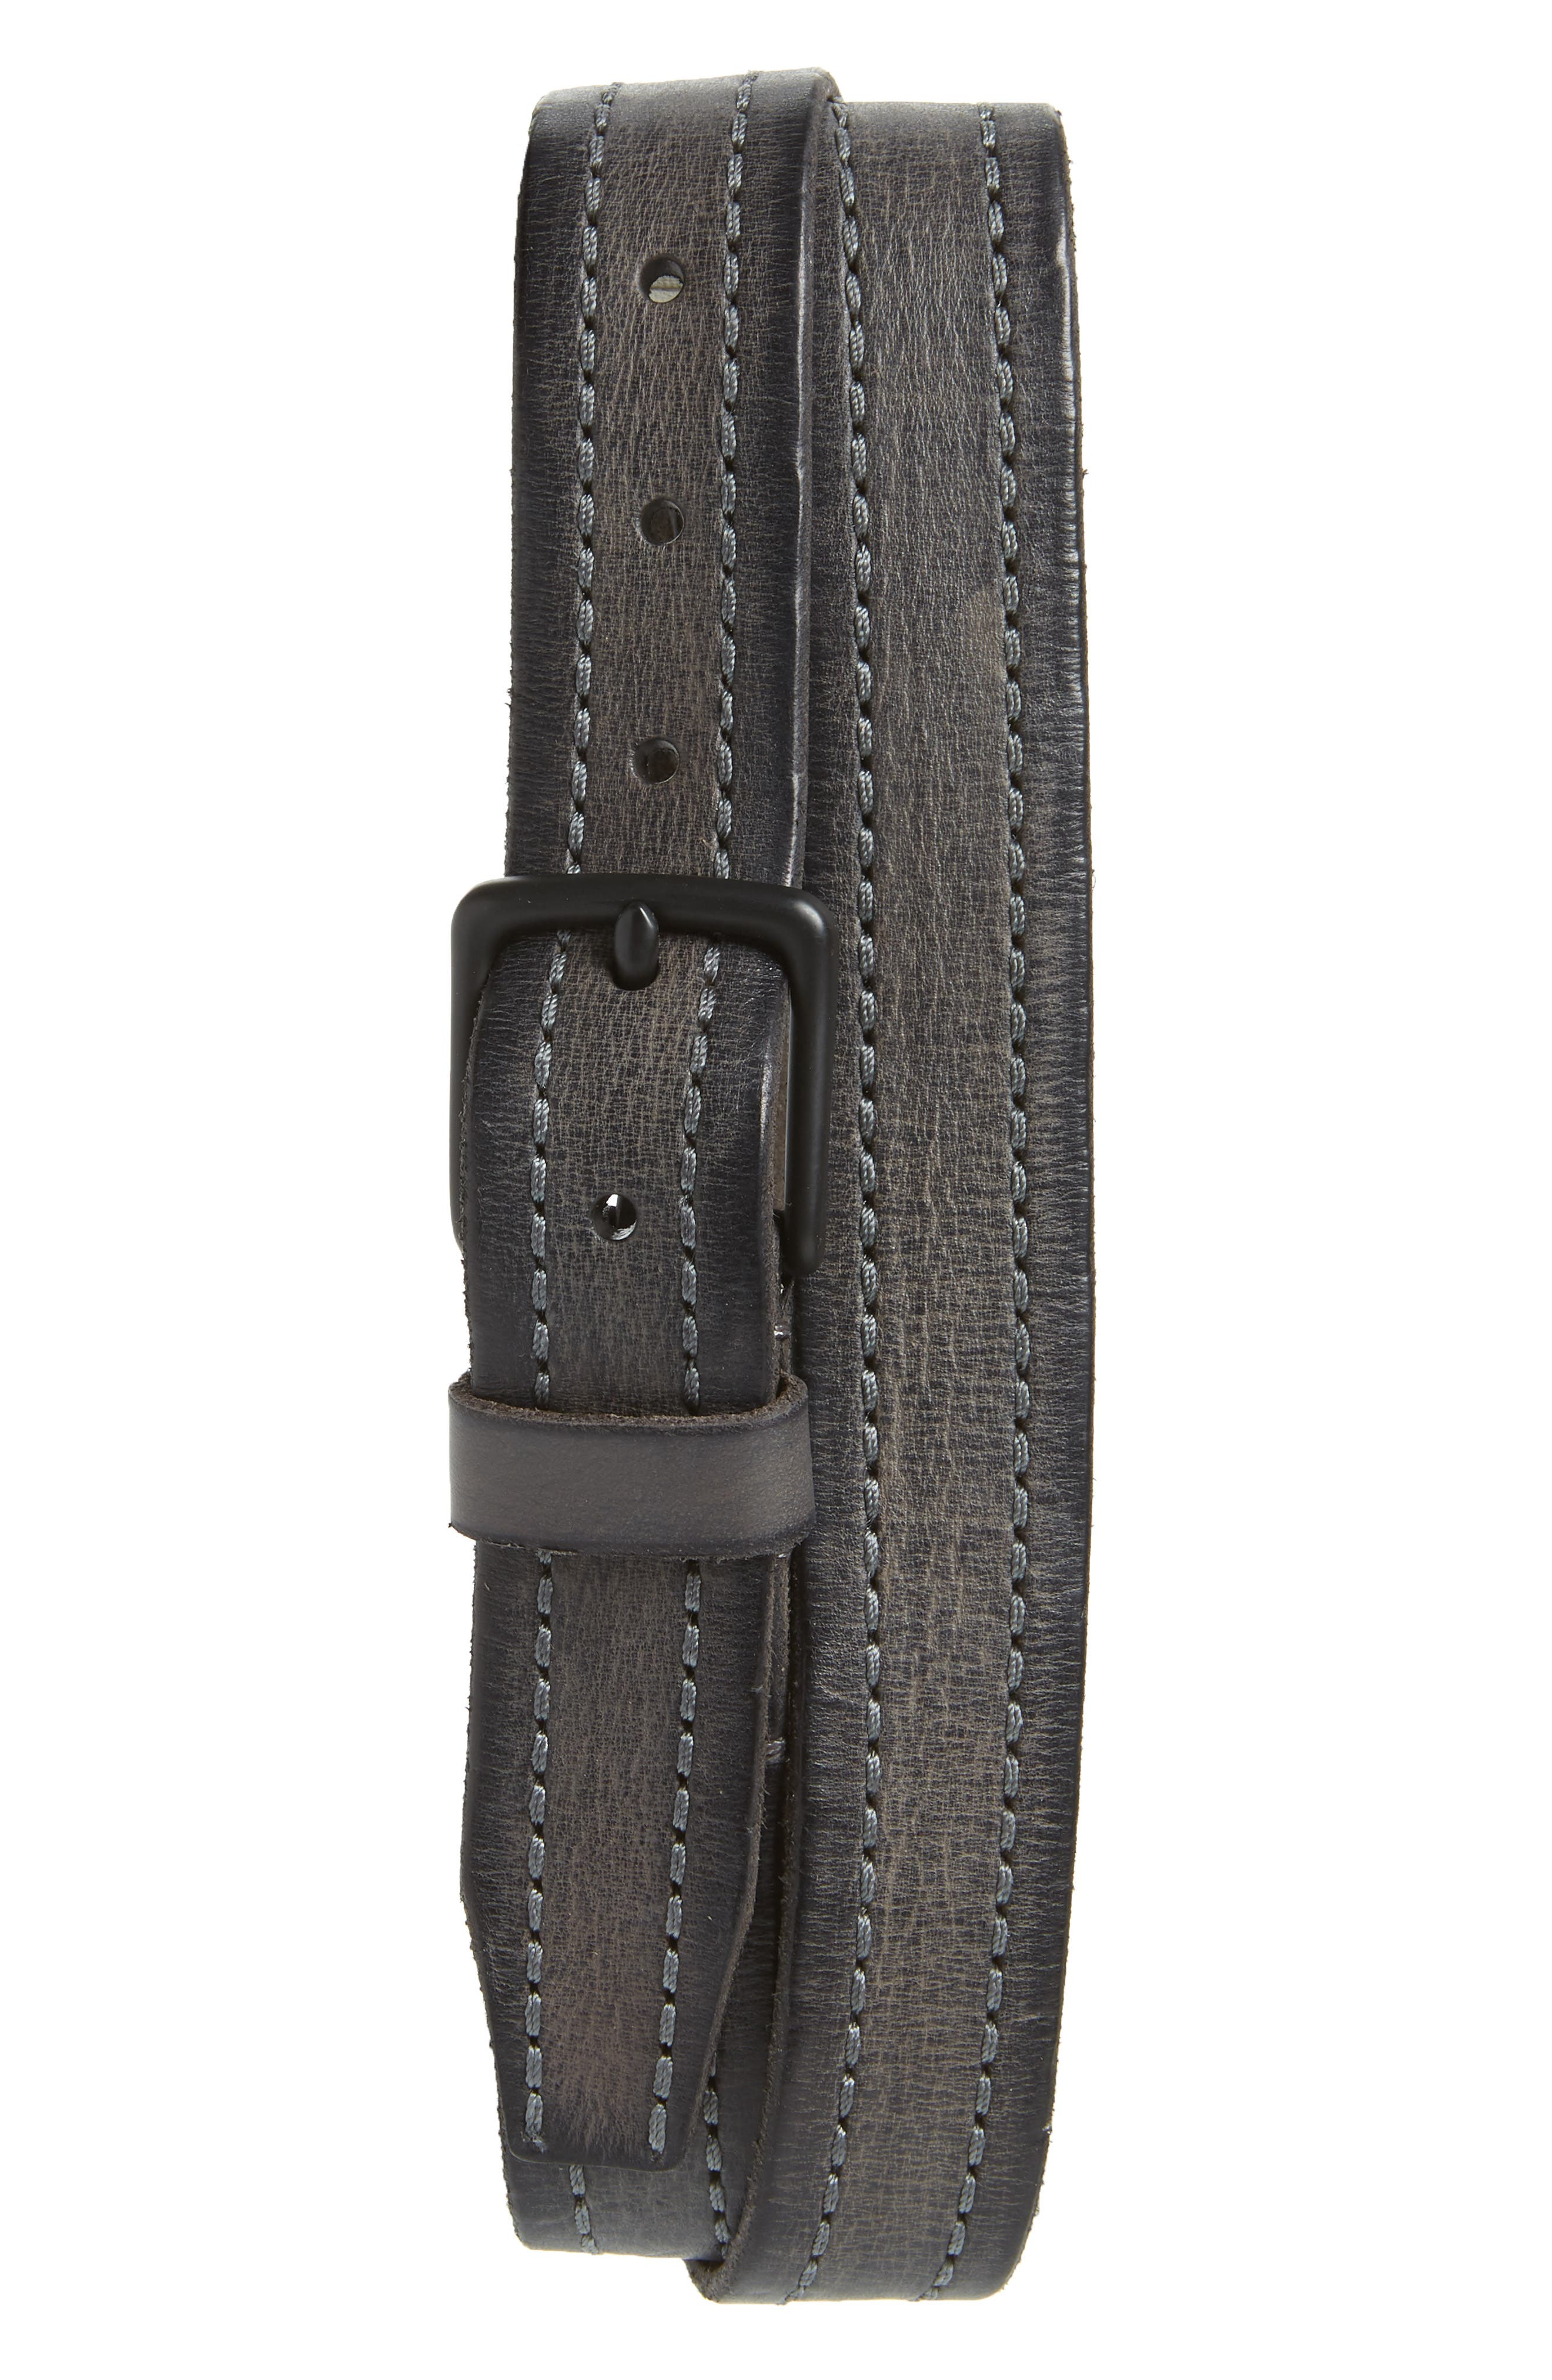 Allsaints Stitched Leather Belt, Anthracite Grey